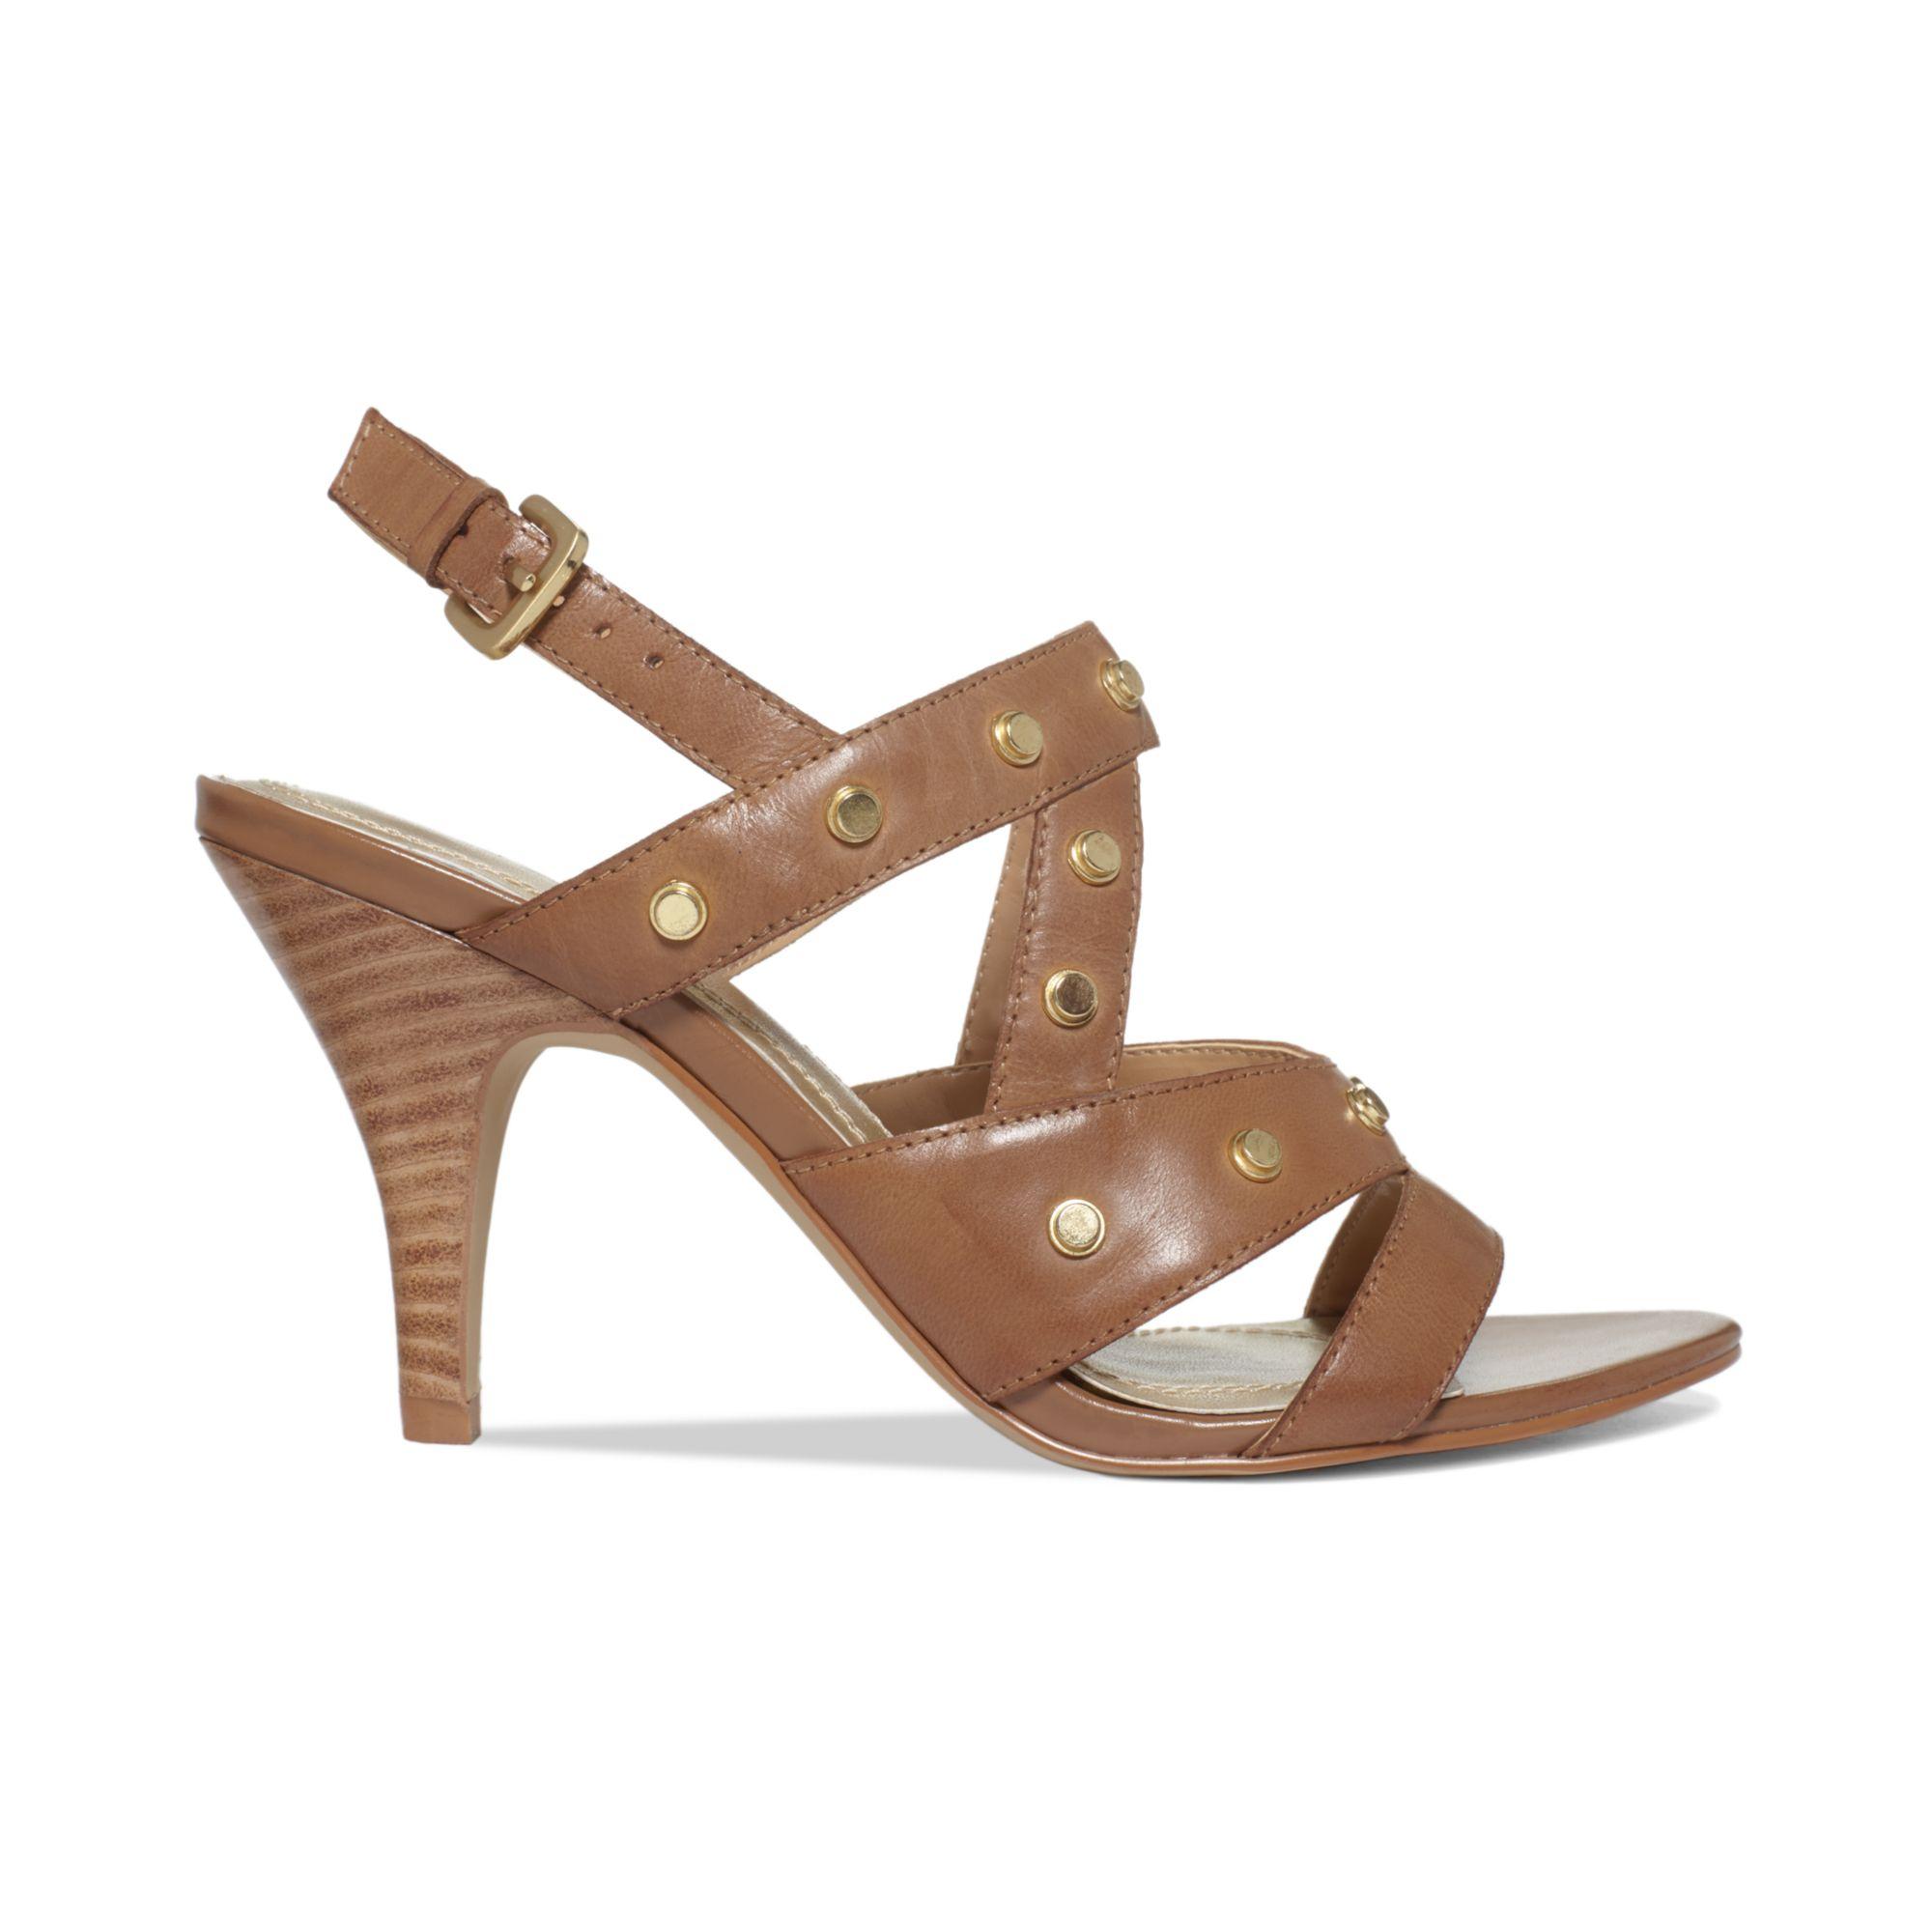 Lyst Tahari Womens Claire Mid Heel Sandals In Brown